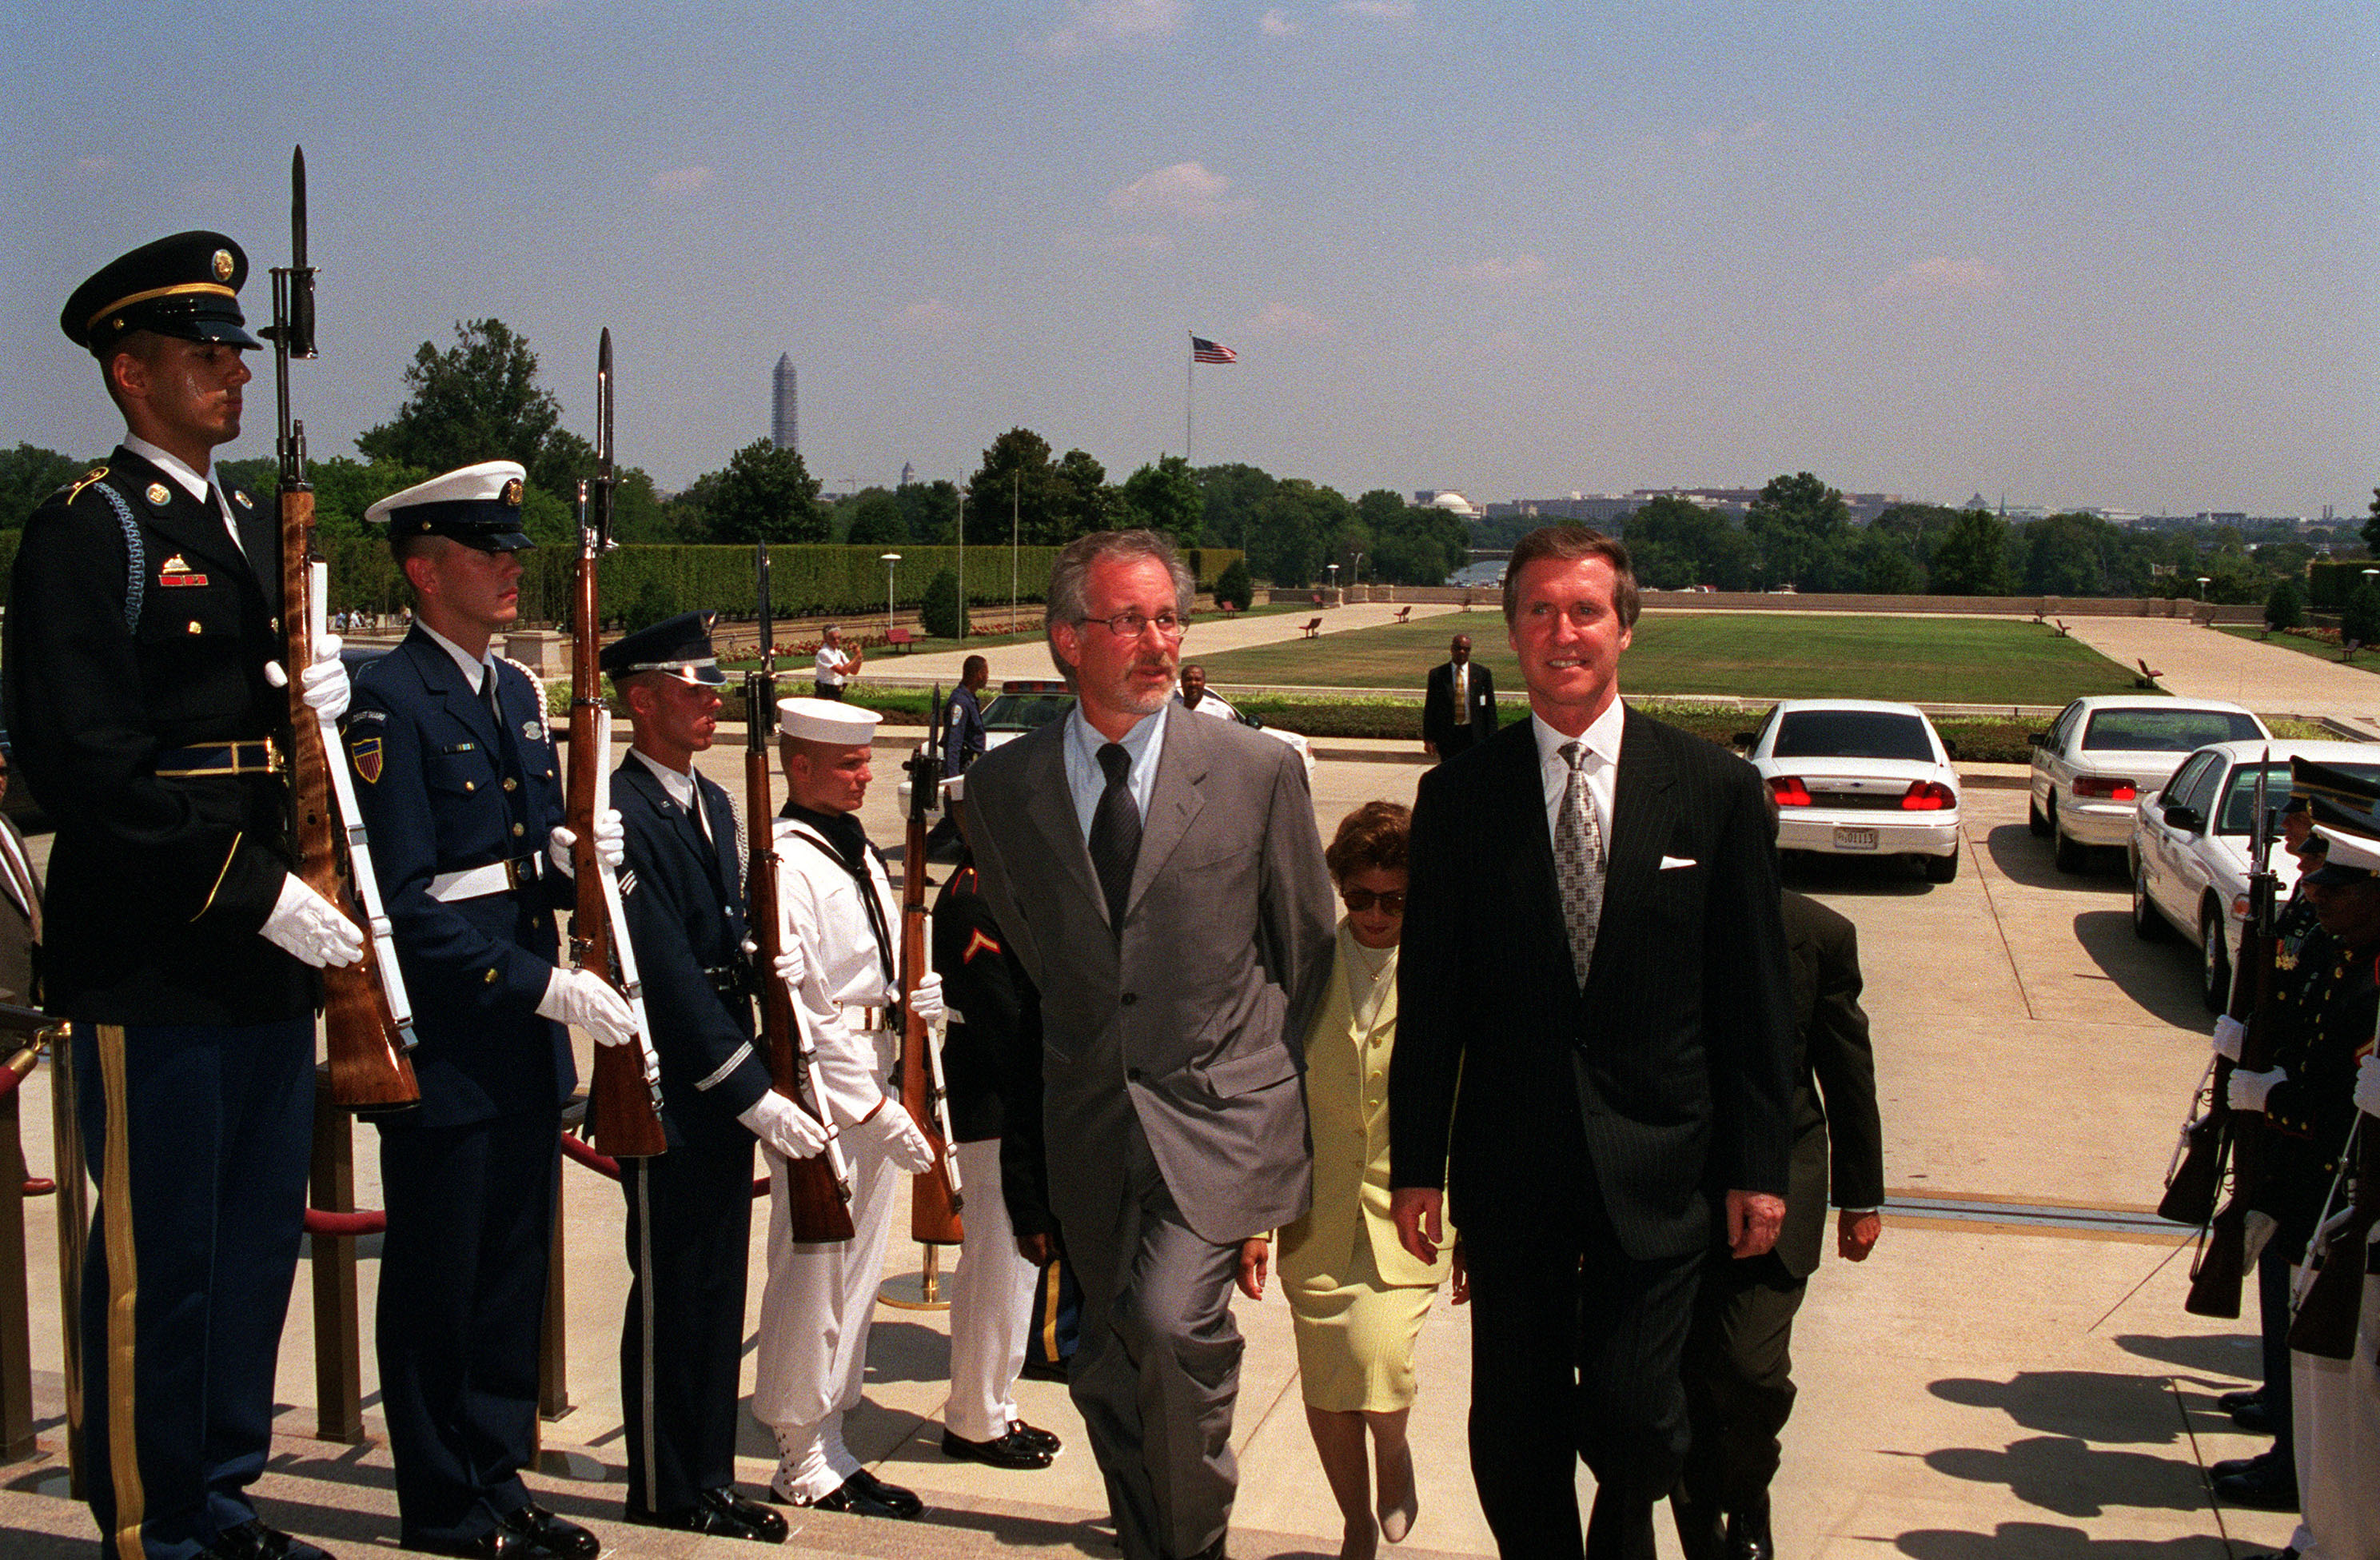 Secretary of Defense William S. Cohen escorts Spielberg through a military honor cordon into the Pentagon.